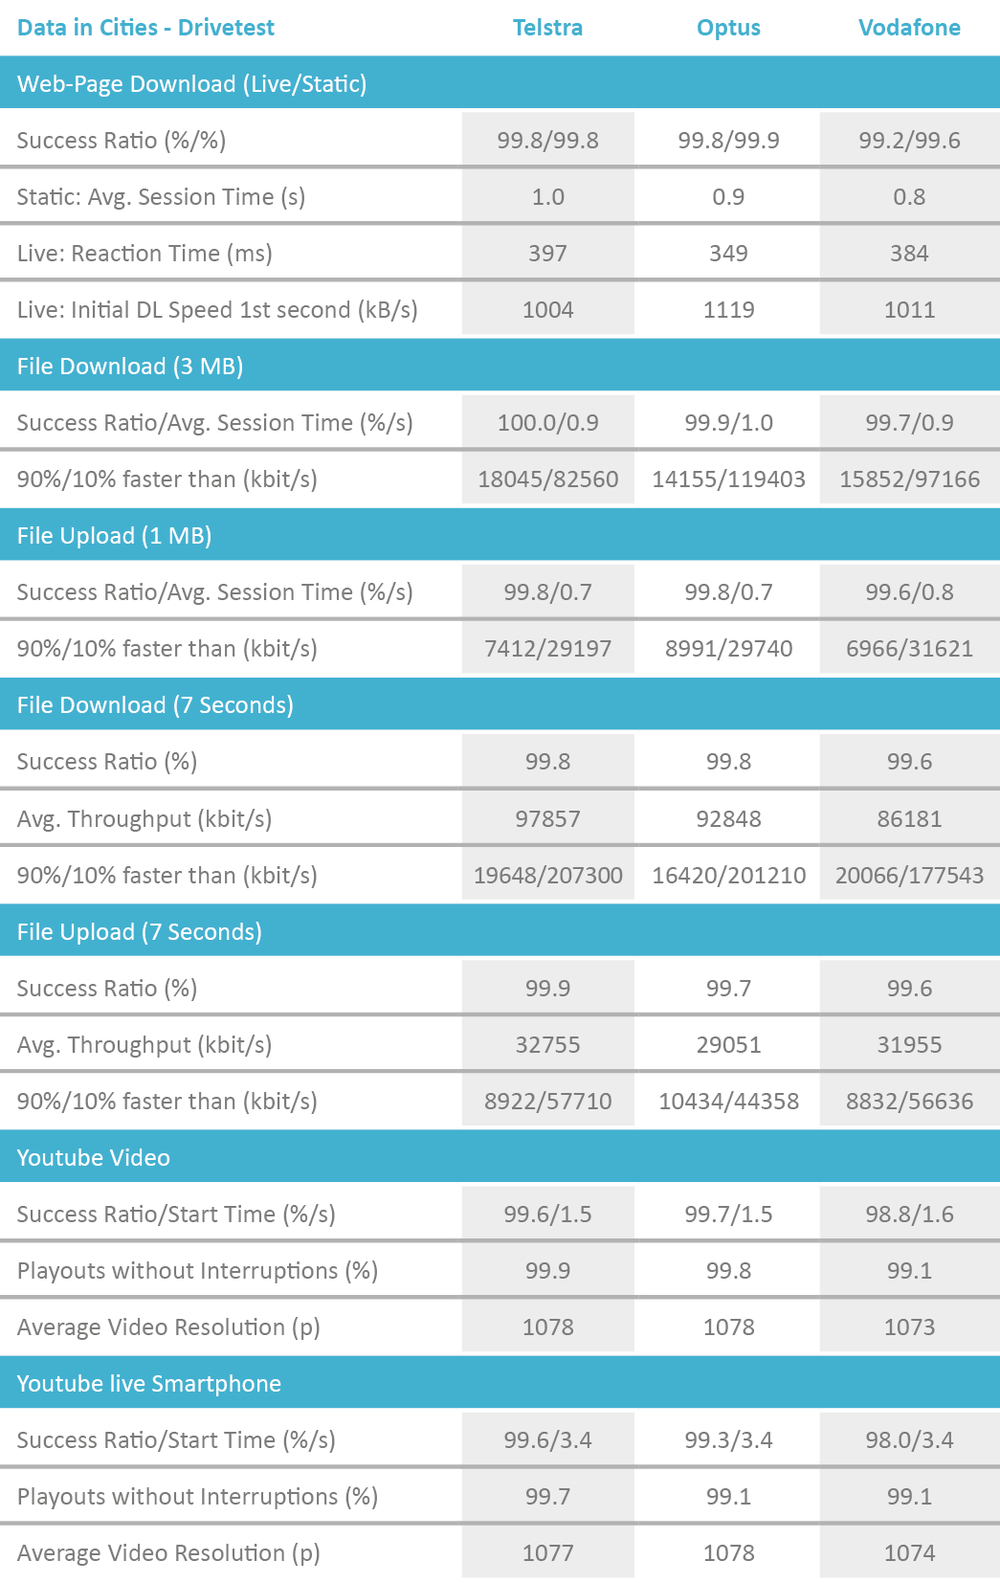 AUS_Tabelle_DataCities_Drivetest_2018_Englisch.png